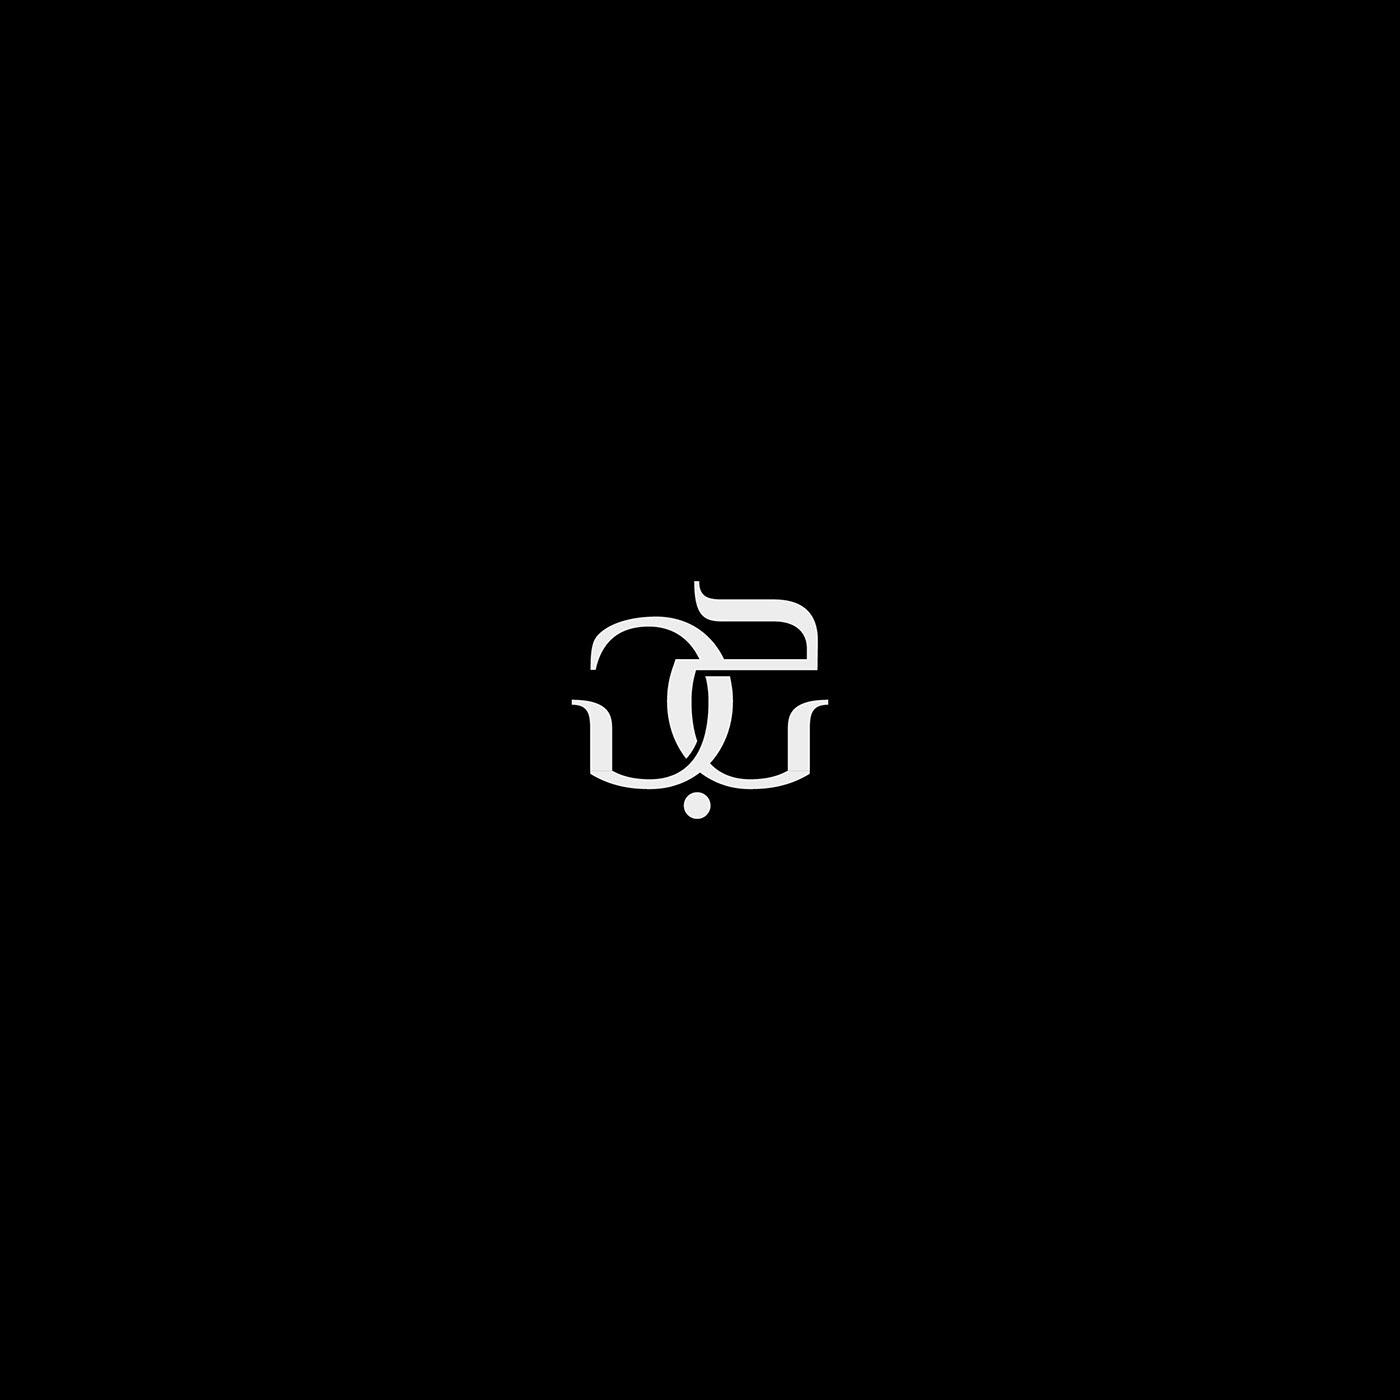 arabic,arabic calligraphy,arabic lettering,Arabic logo,arabic typography,Calligraphy  ,kufic,lettering,Logo Design,typography